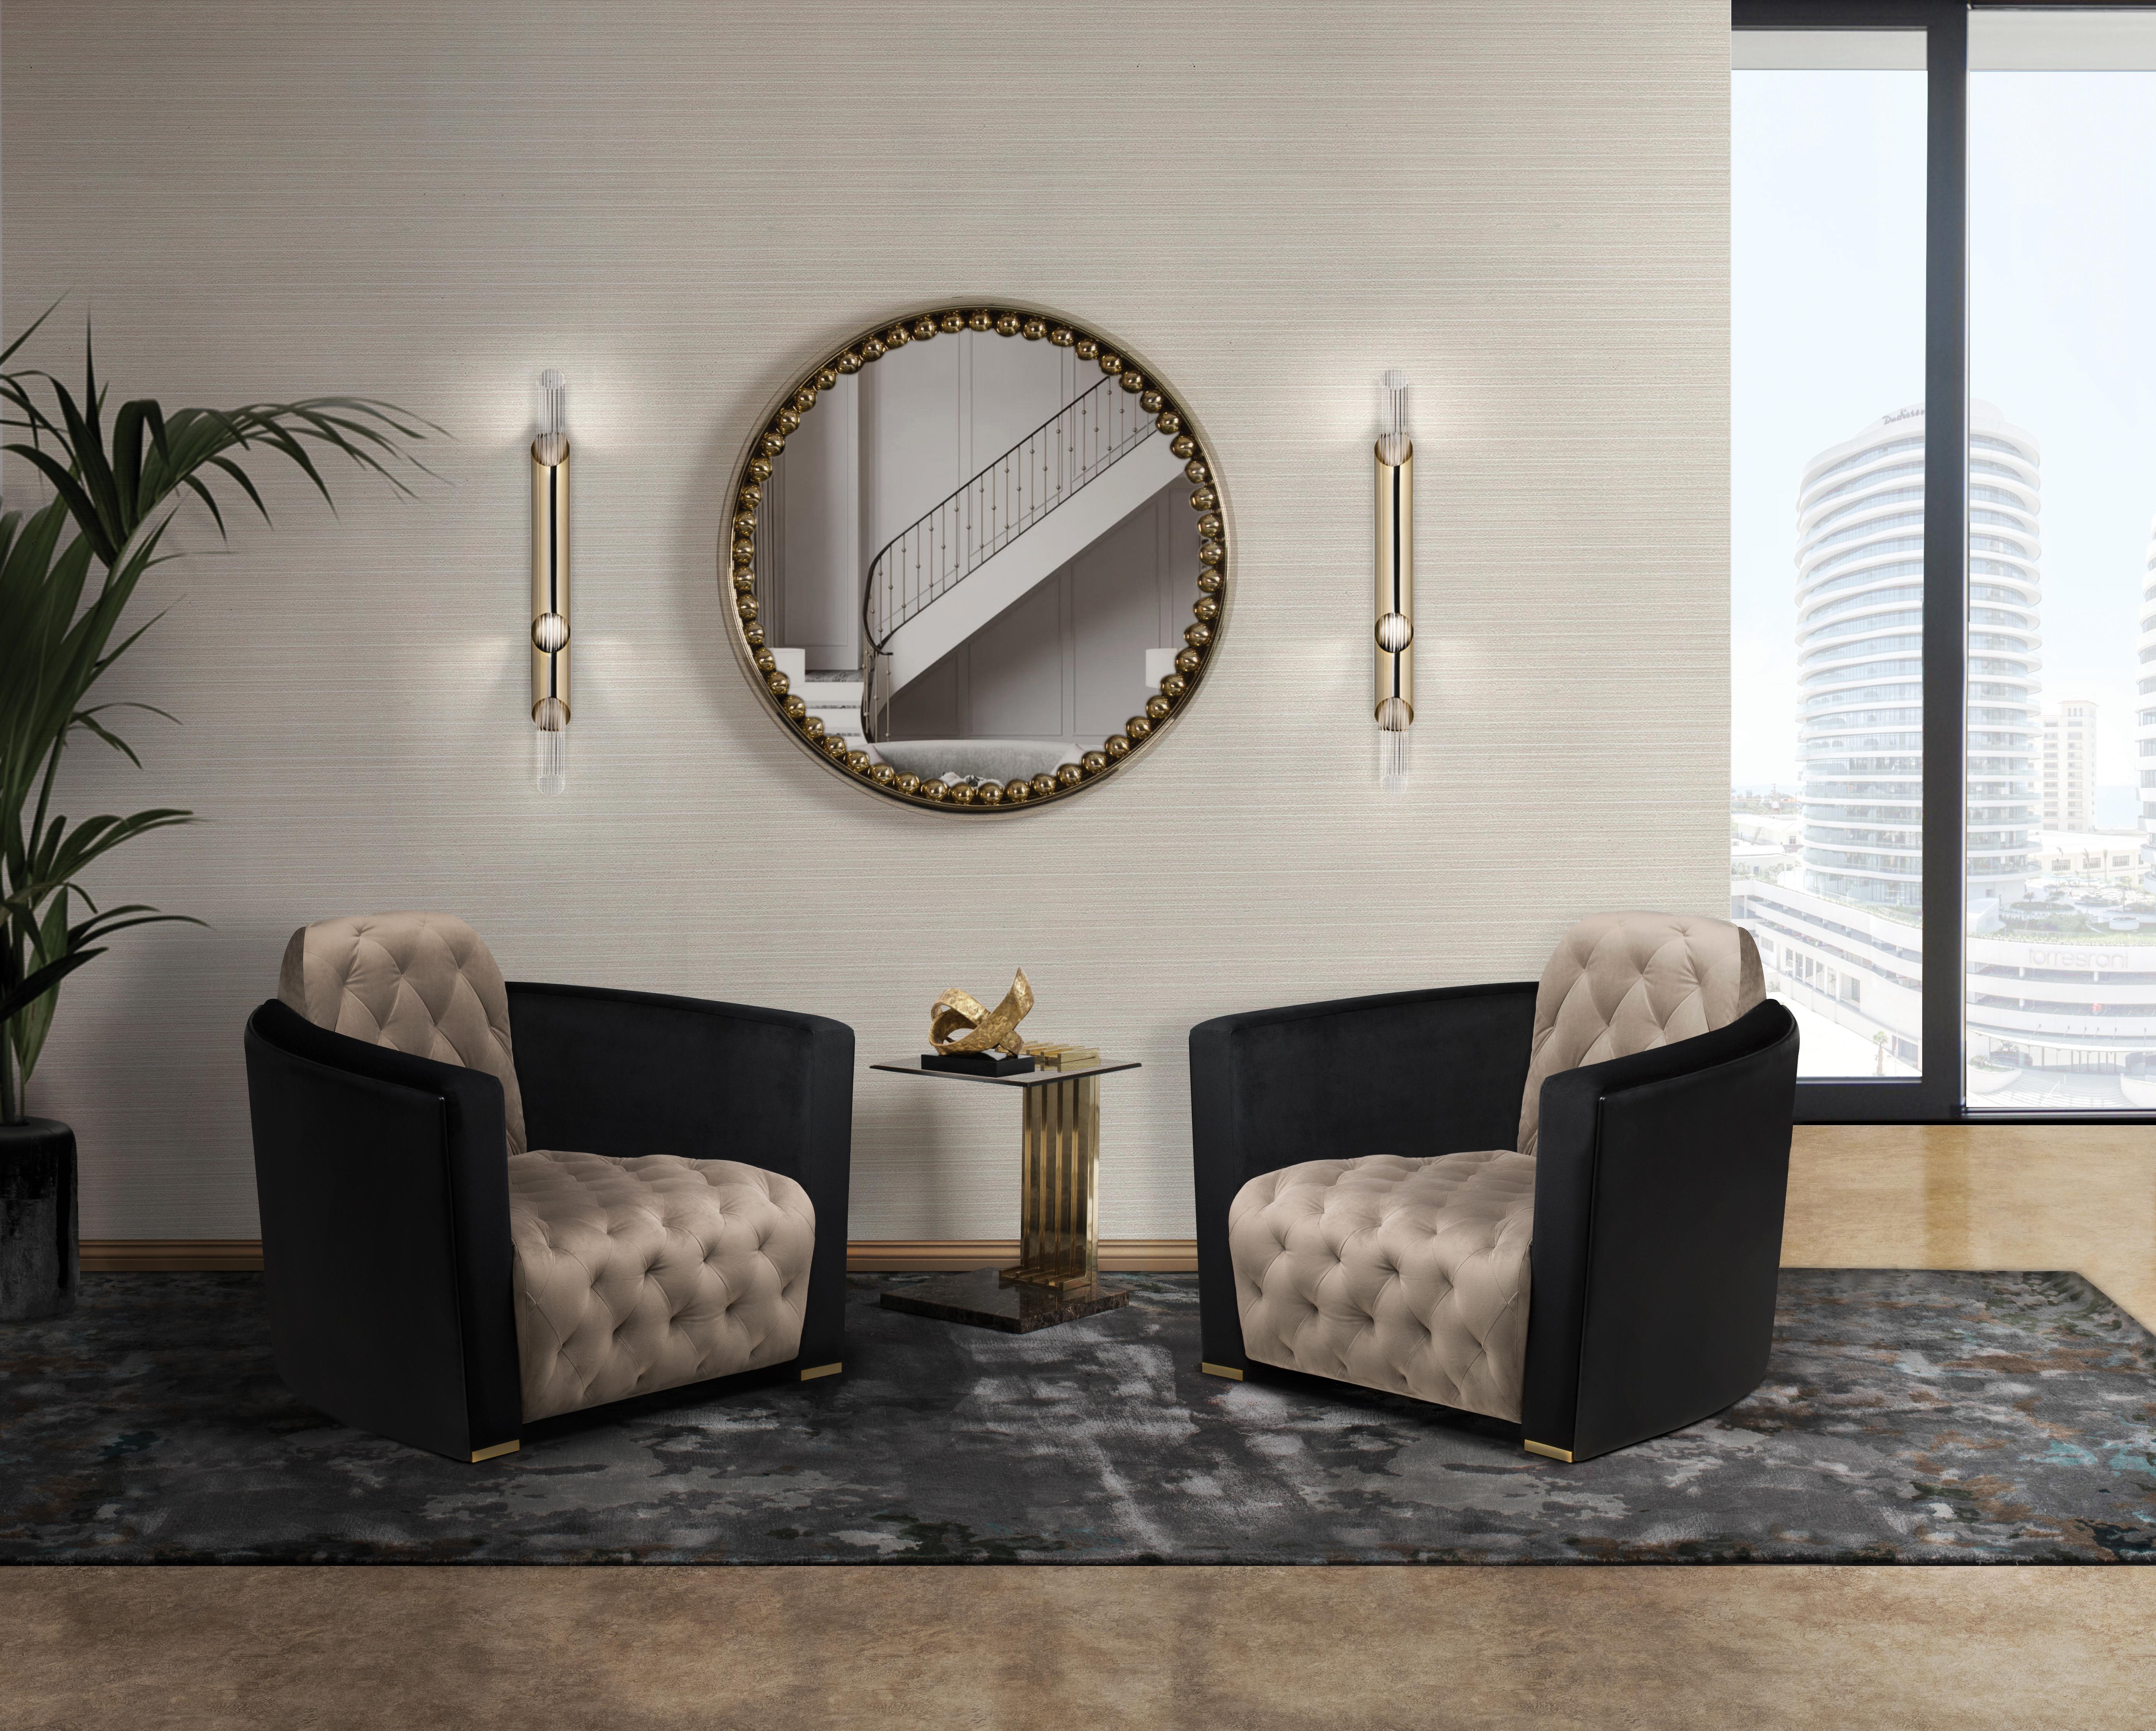 Living Room Trends: Modern Classic living room trends Living Room Trends: Modern Classic navis single sofa cover 05